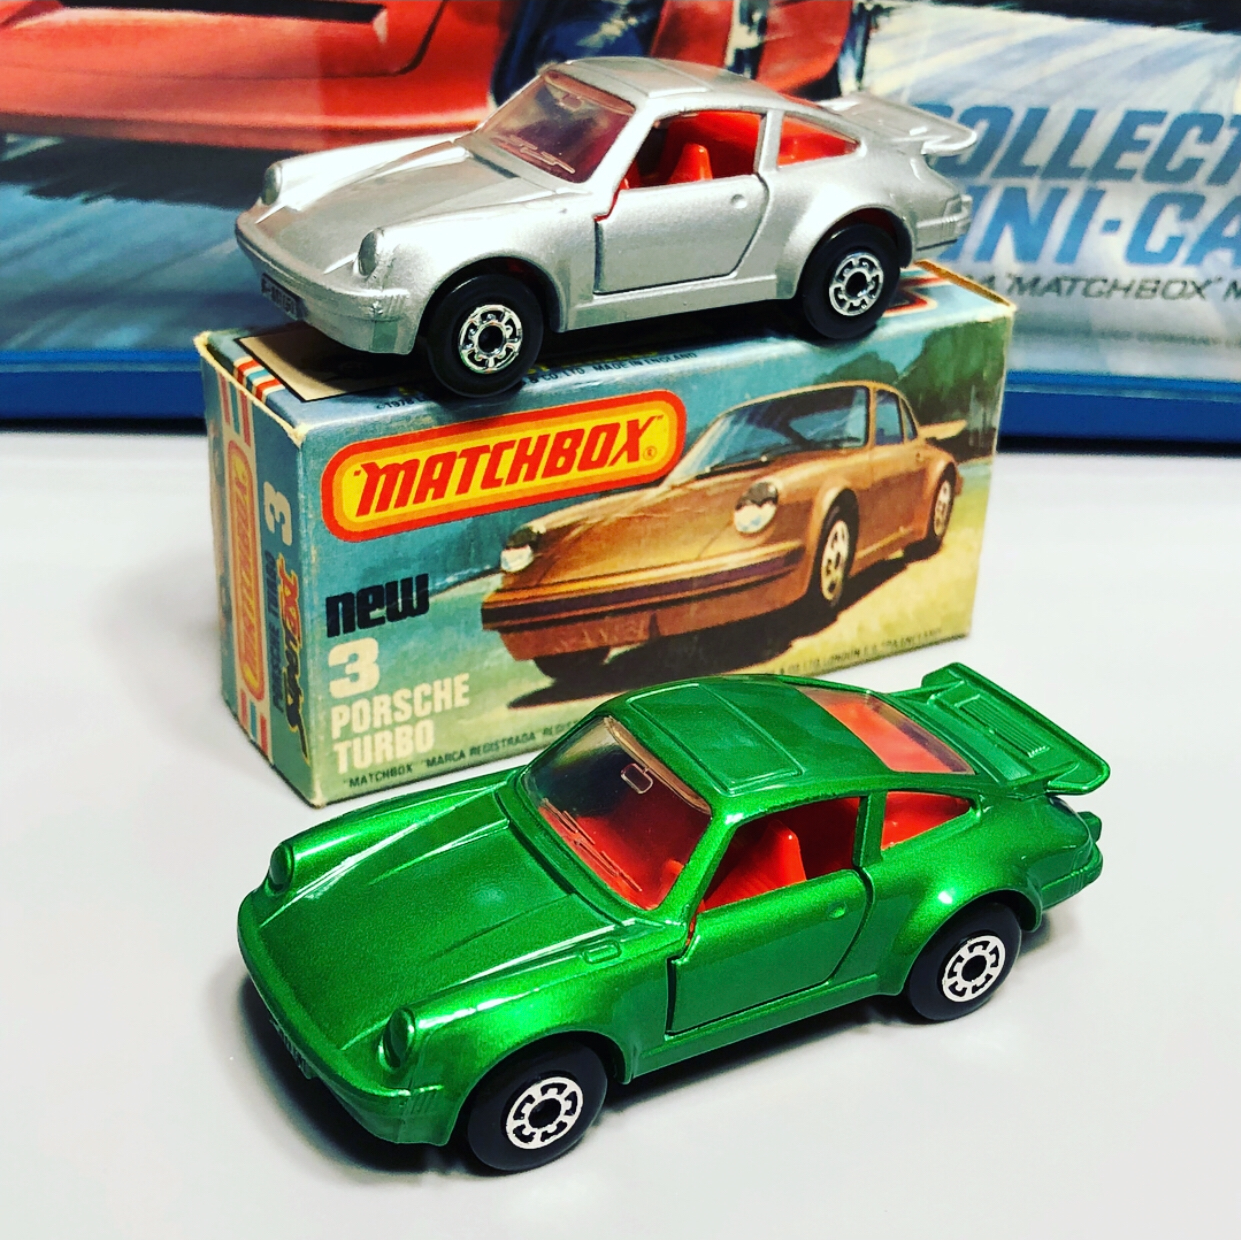 Pin By Σακης On μοντελισμος Toy Model Cars Matchbox Cars Matchbox